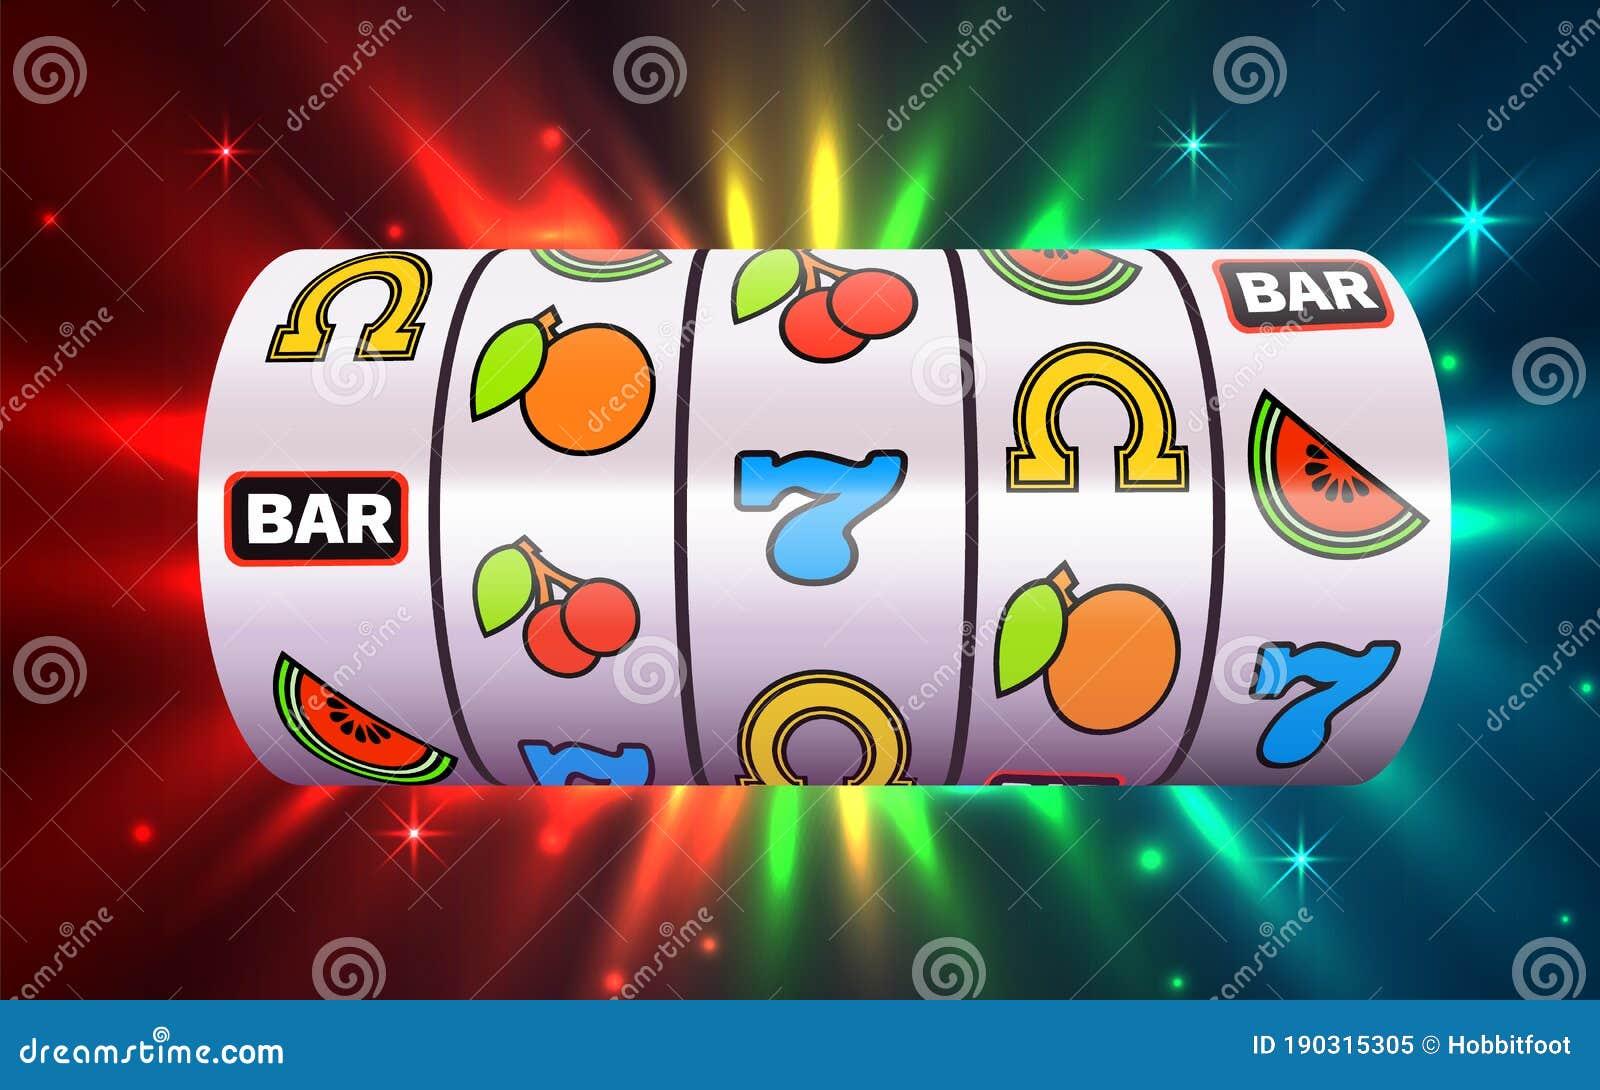 Slot Machine Wins The Jackpot. Online Casino Banner. 777 Casino Background  Stock Vector - Illustration of online, jackpot: 190315305